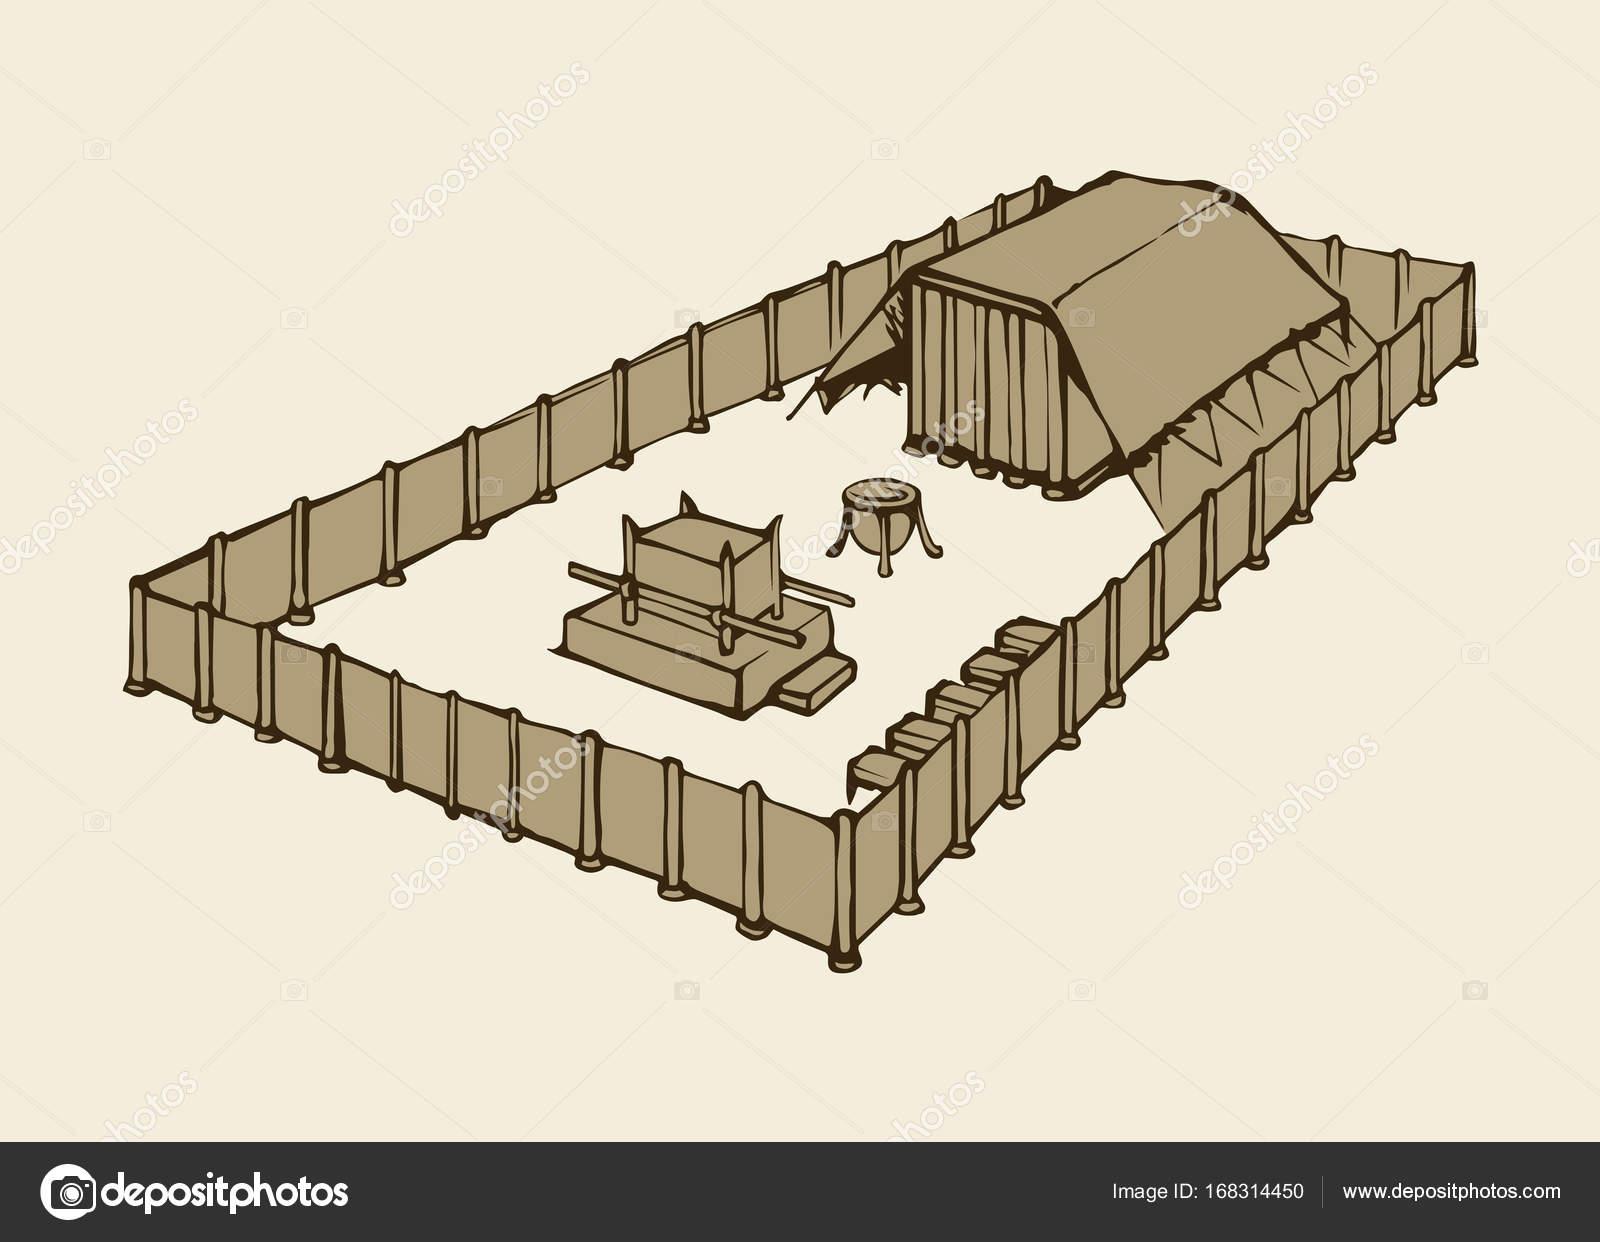 Imágenes Tabernaculo Moises Tabernáculo De Moisés Dibujo